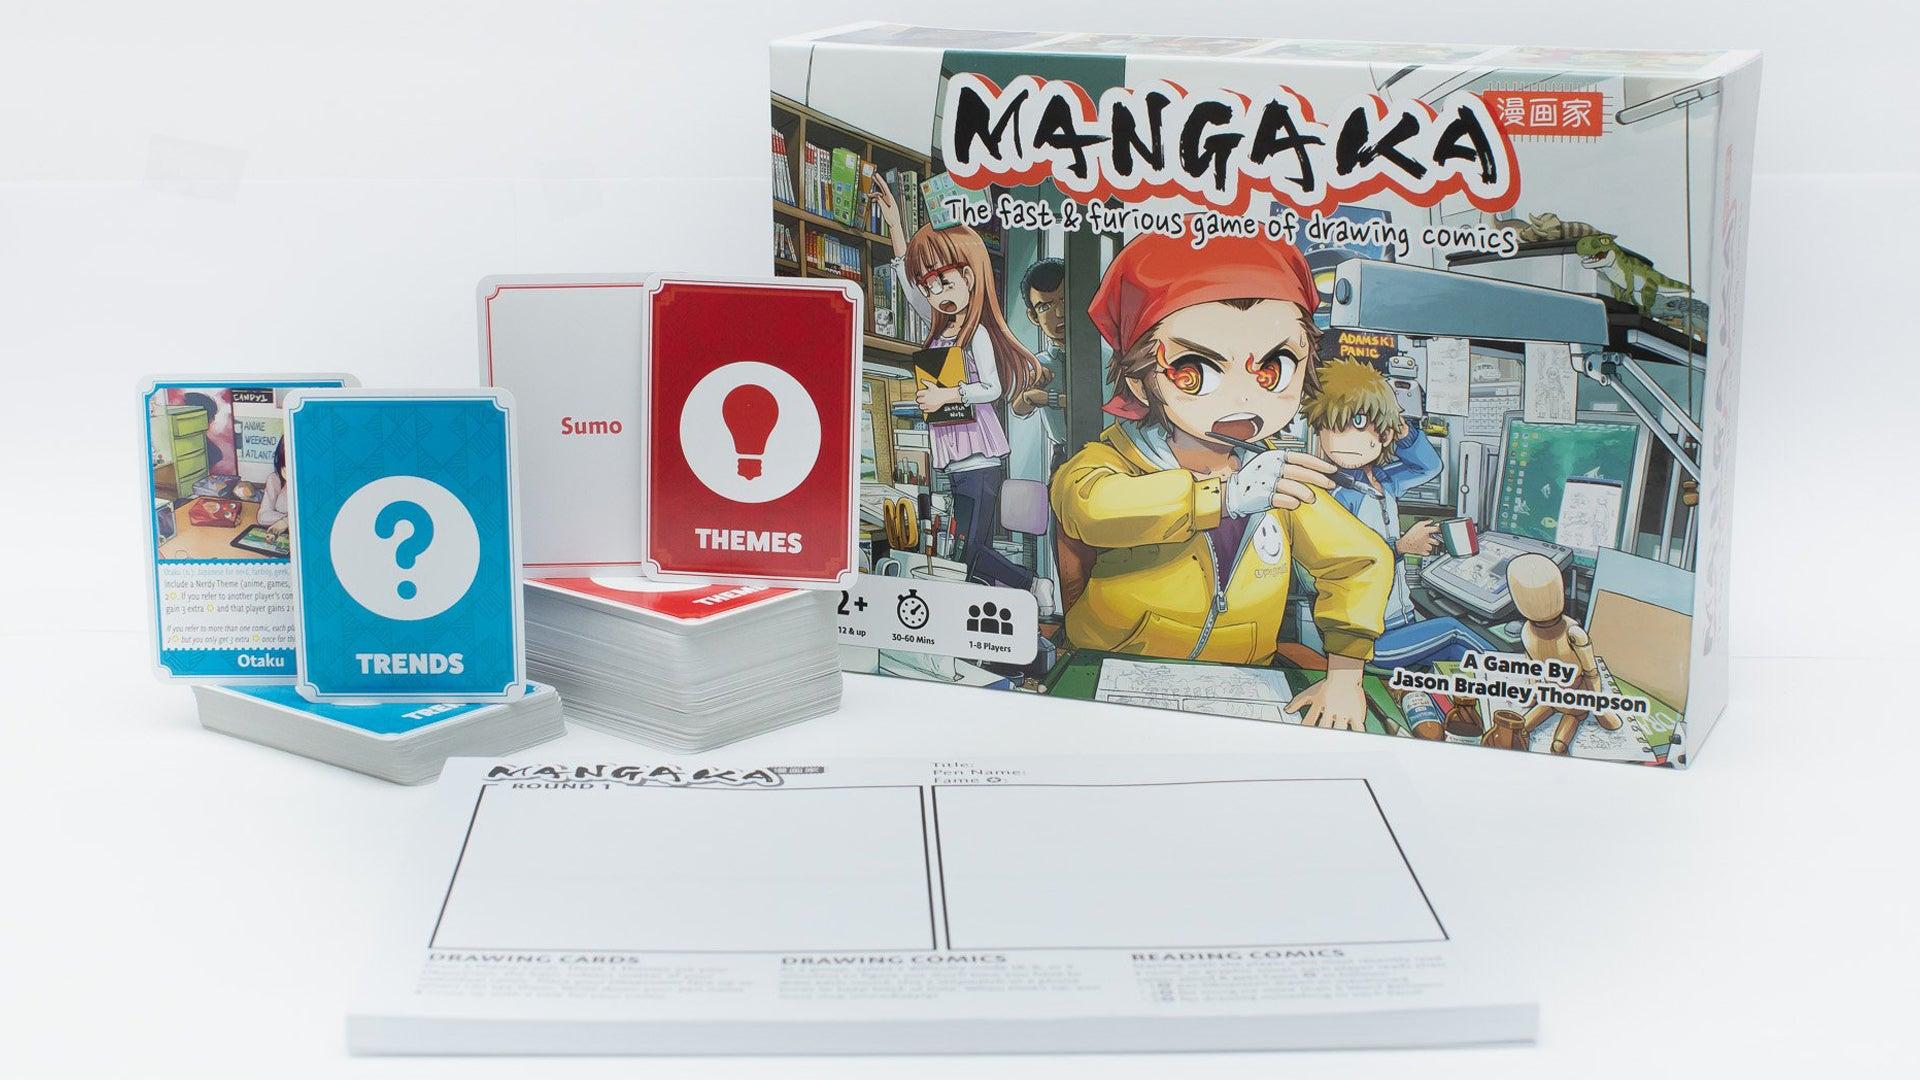 mangaka-board-game-contents.jpg